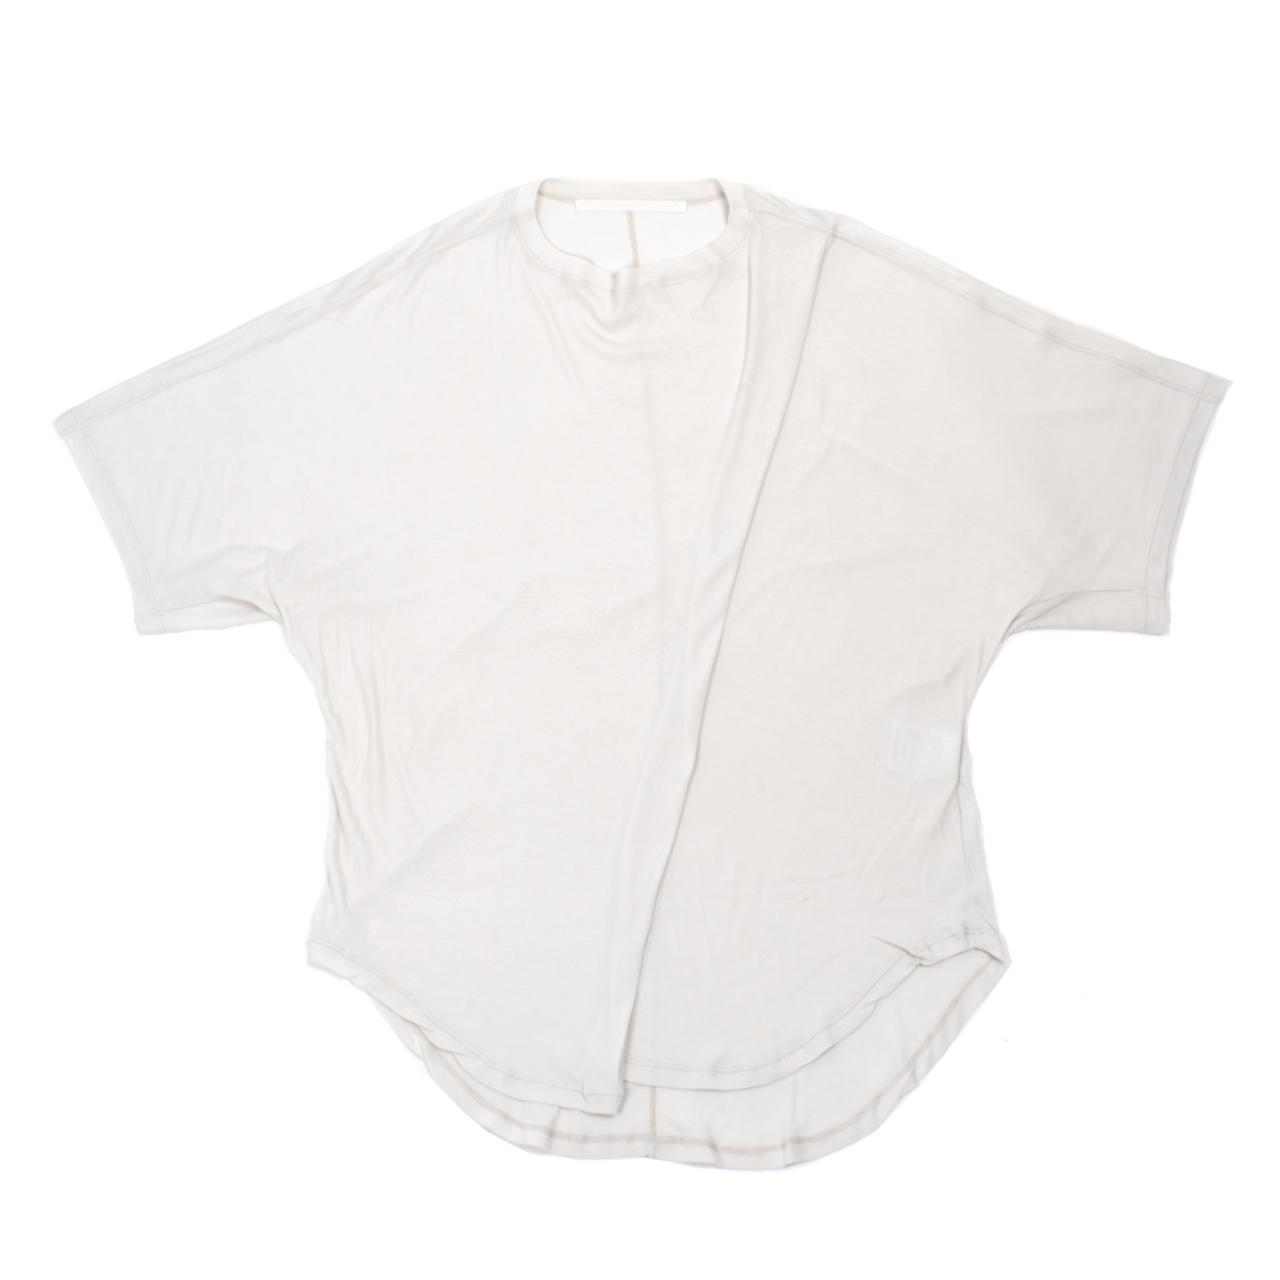 707CUM6-PLASTER / ドロップカラー オーバーサイズ Tシャツ